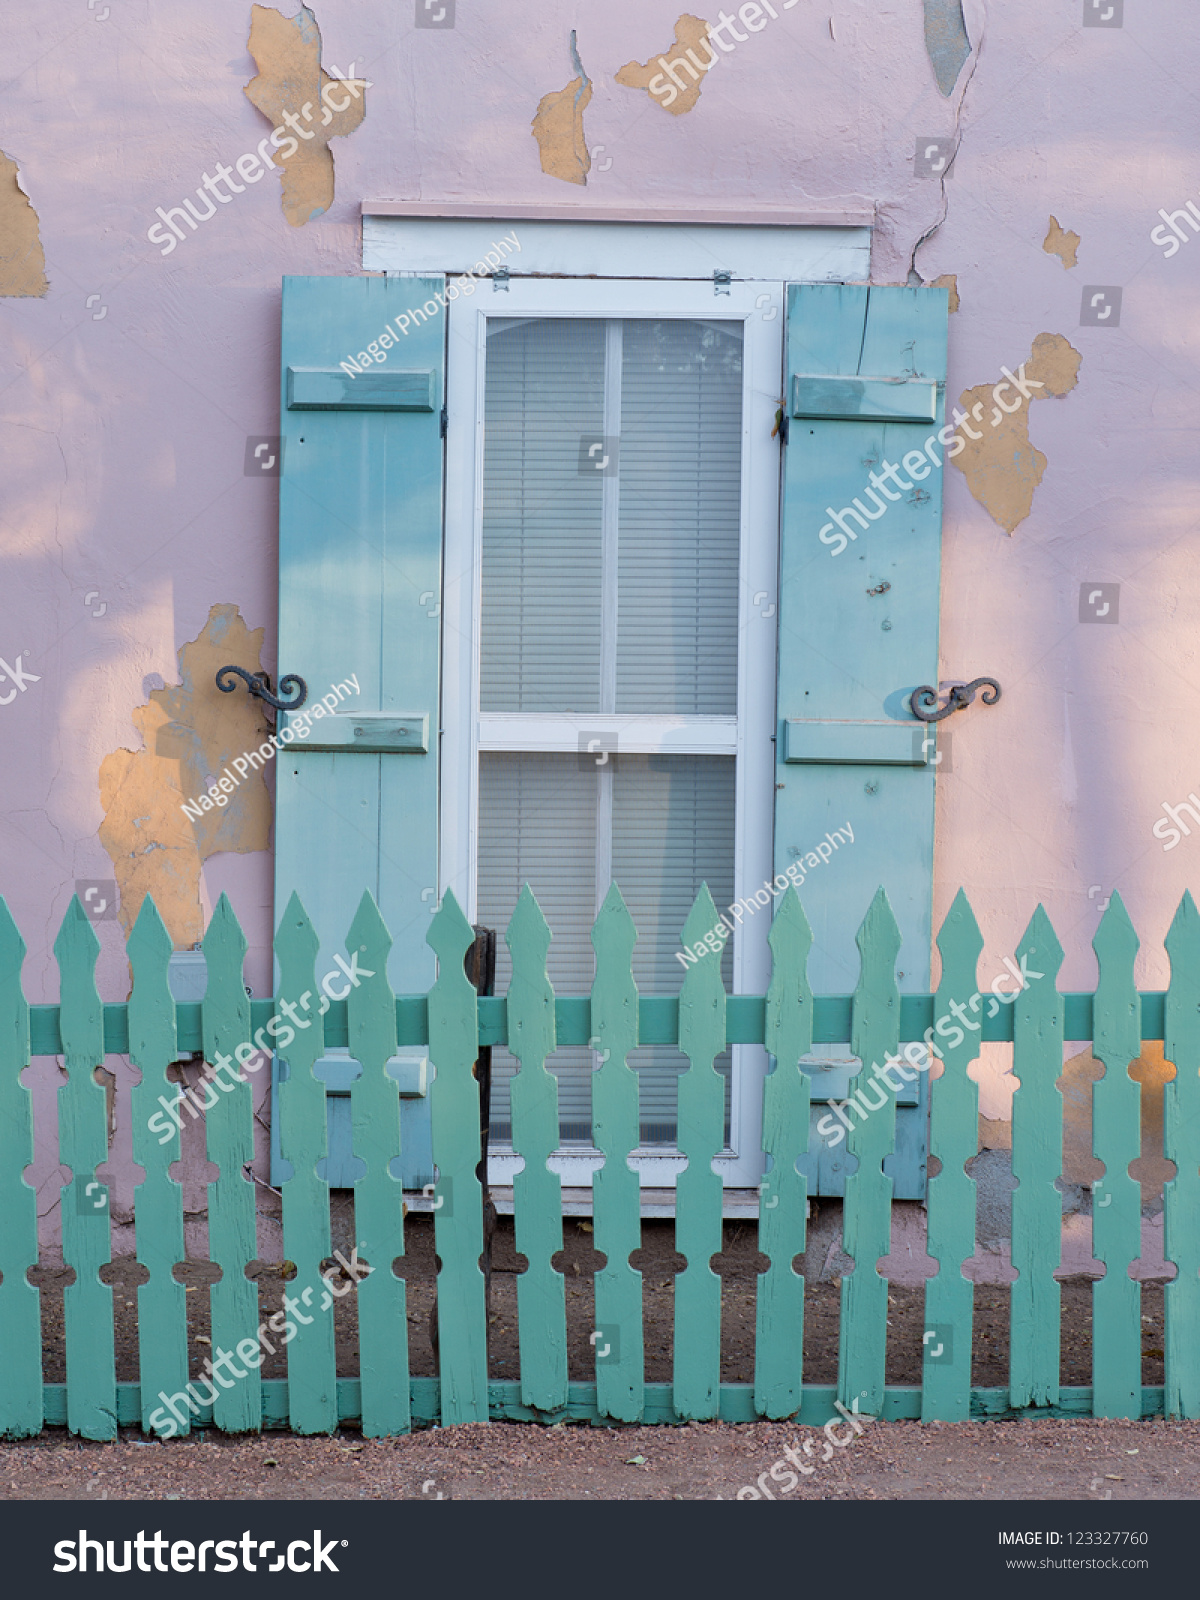 matching green picket fence window shutters stock photo